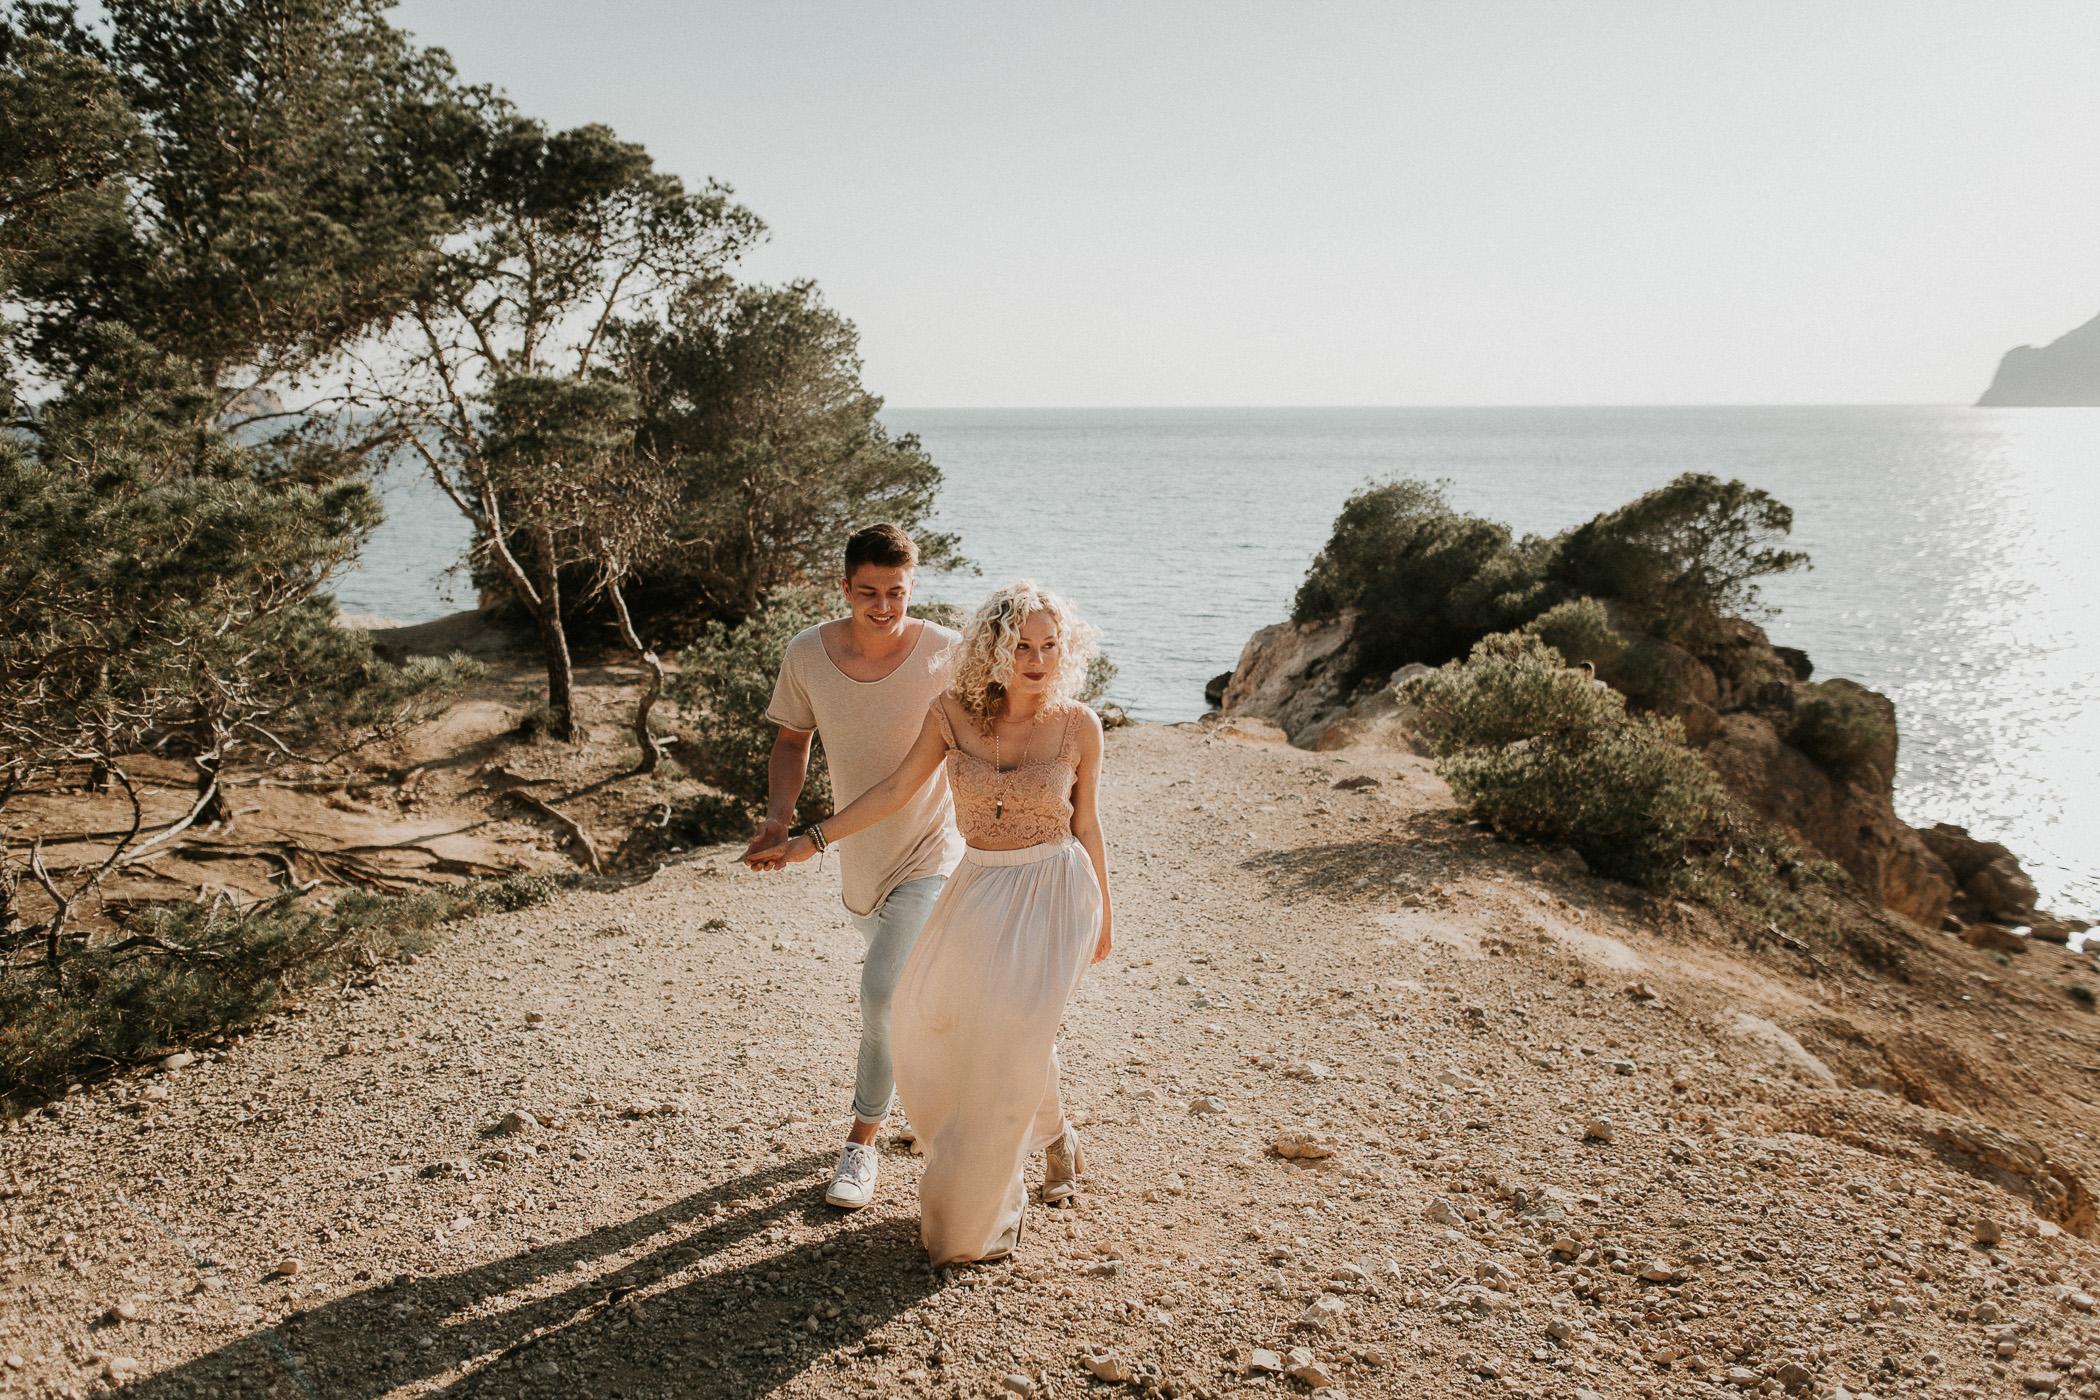 DanielaMarquardtPhotography_elopement_mallorca_spain_paguera_palma_charlyandbela_1